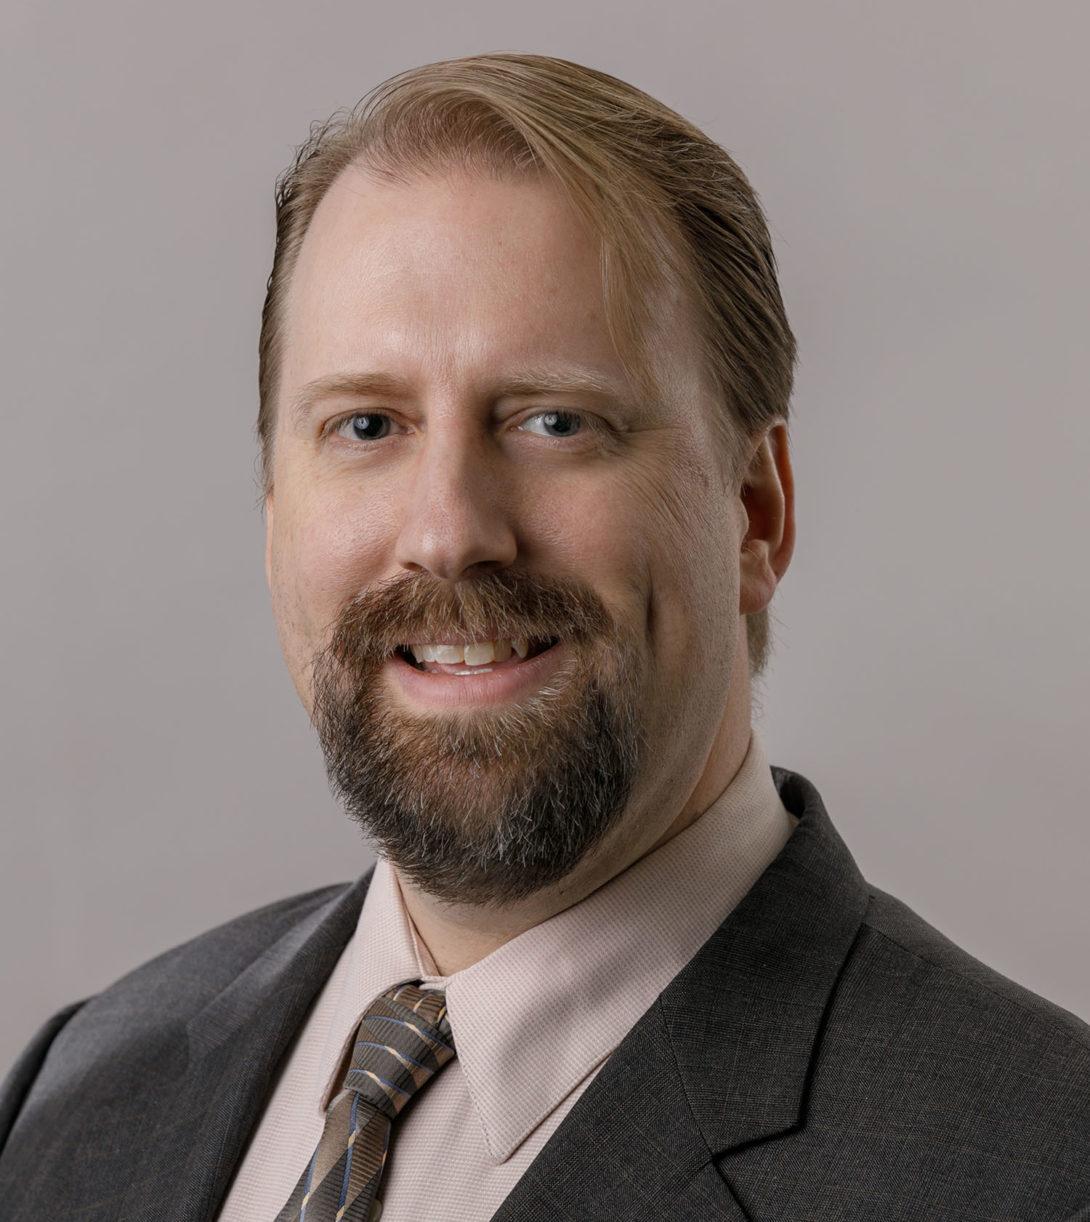 Portrait of Dr. Karl Kochendorfer